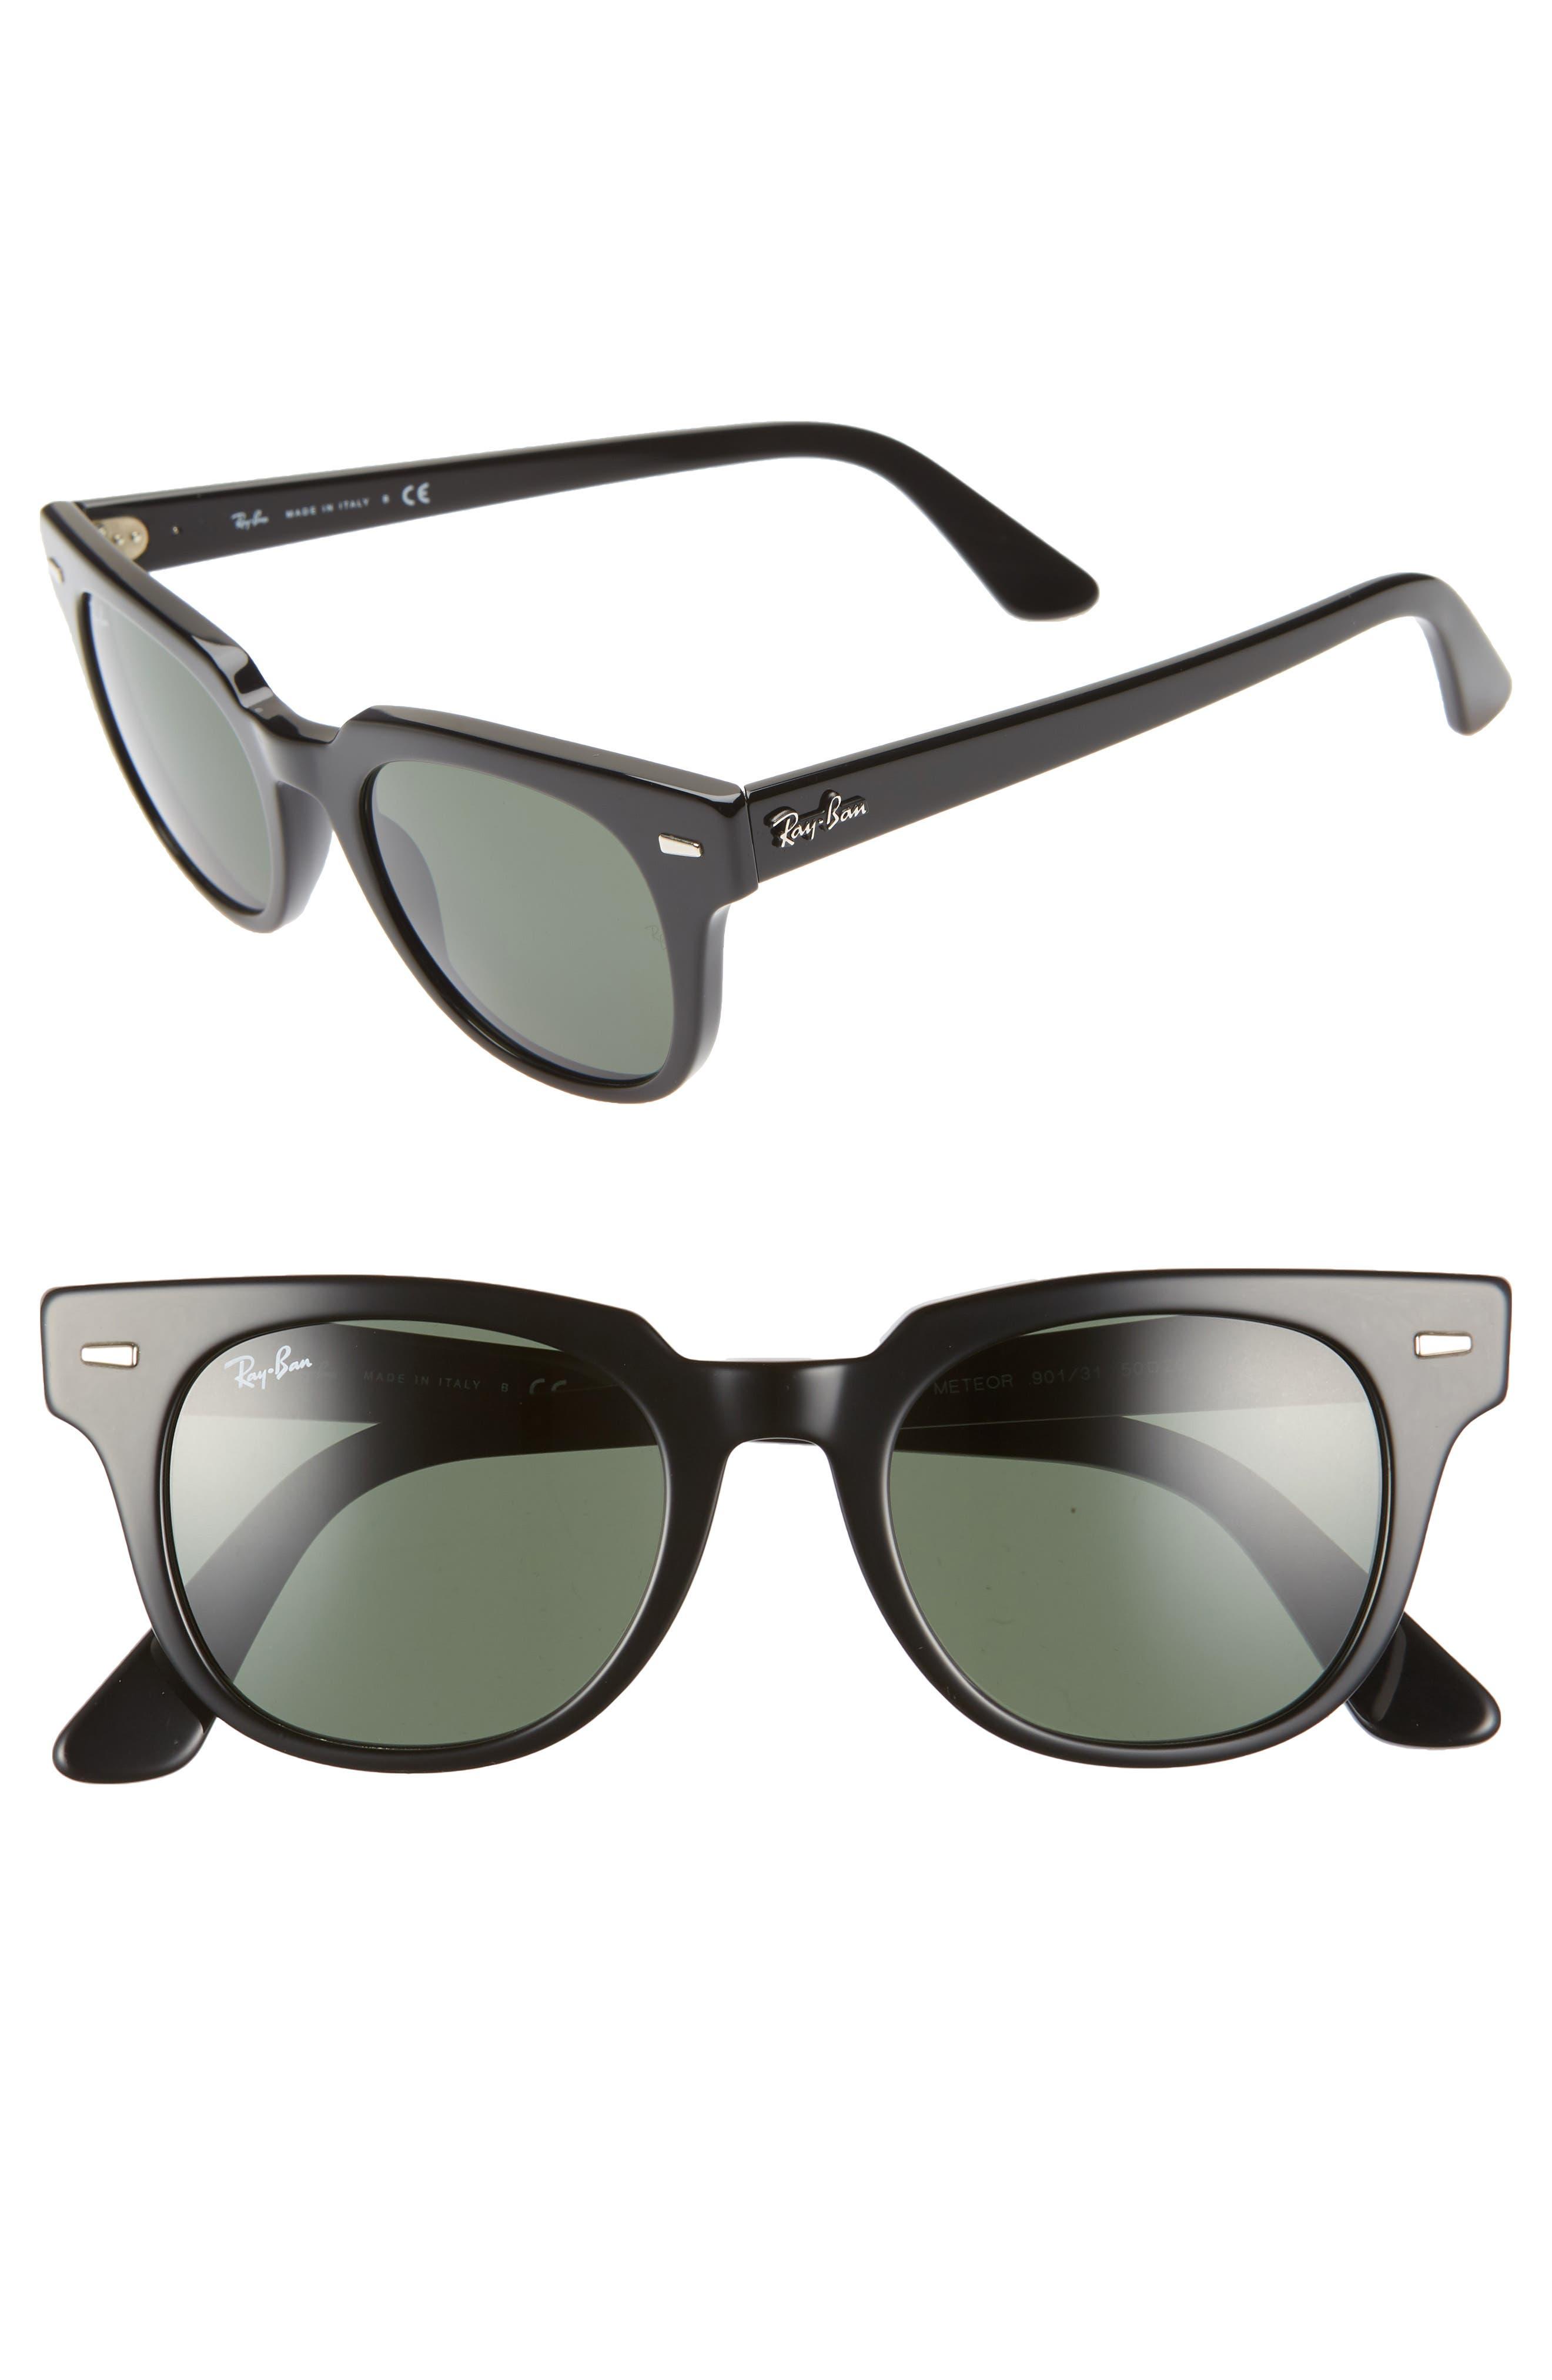 Ray-Ban Wayfarer 50Mm Square Sunglasses -